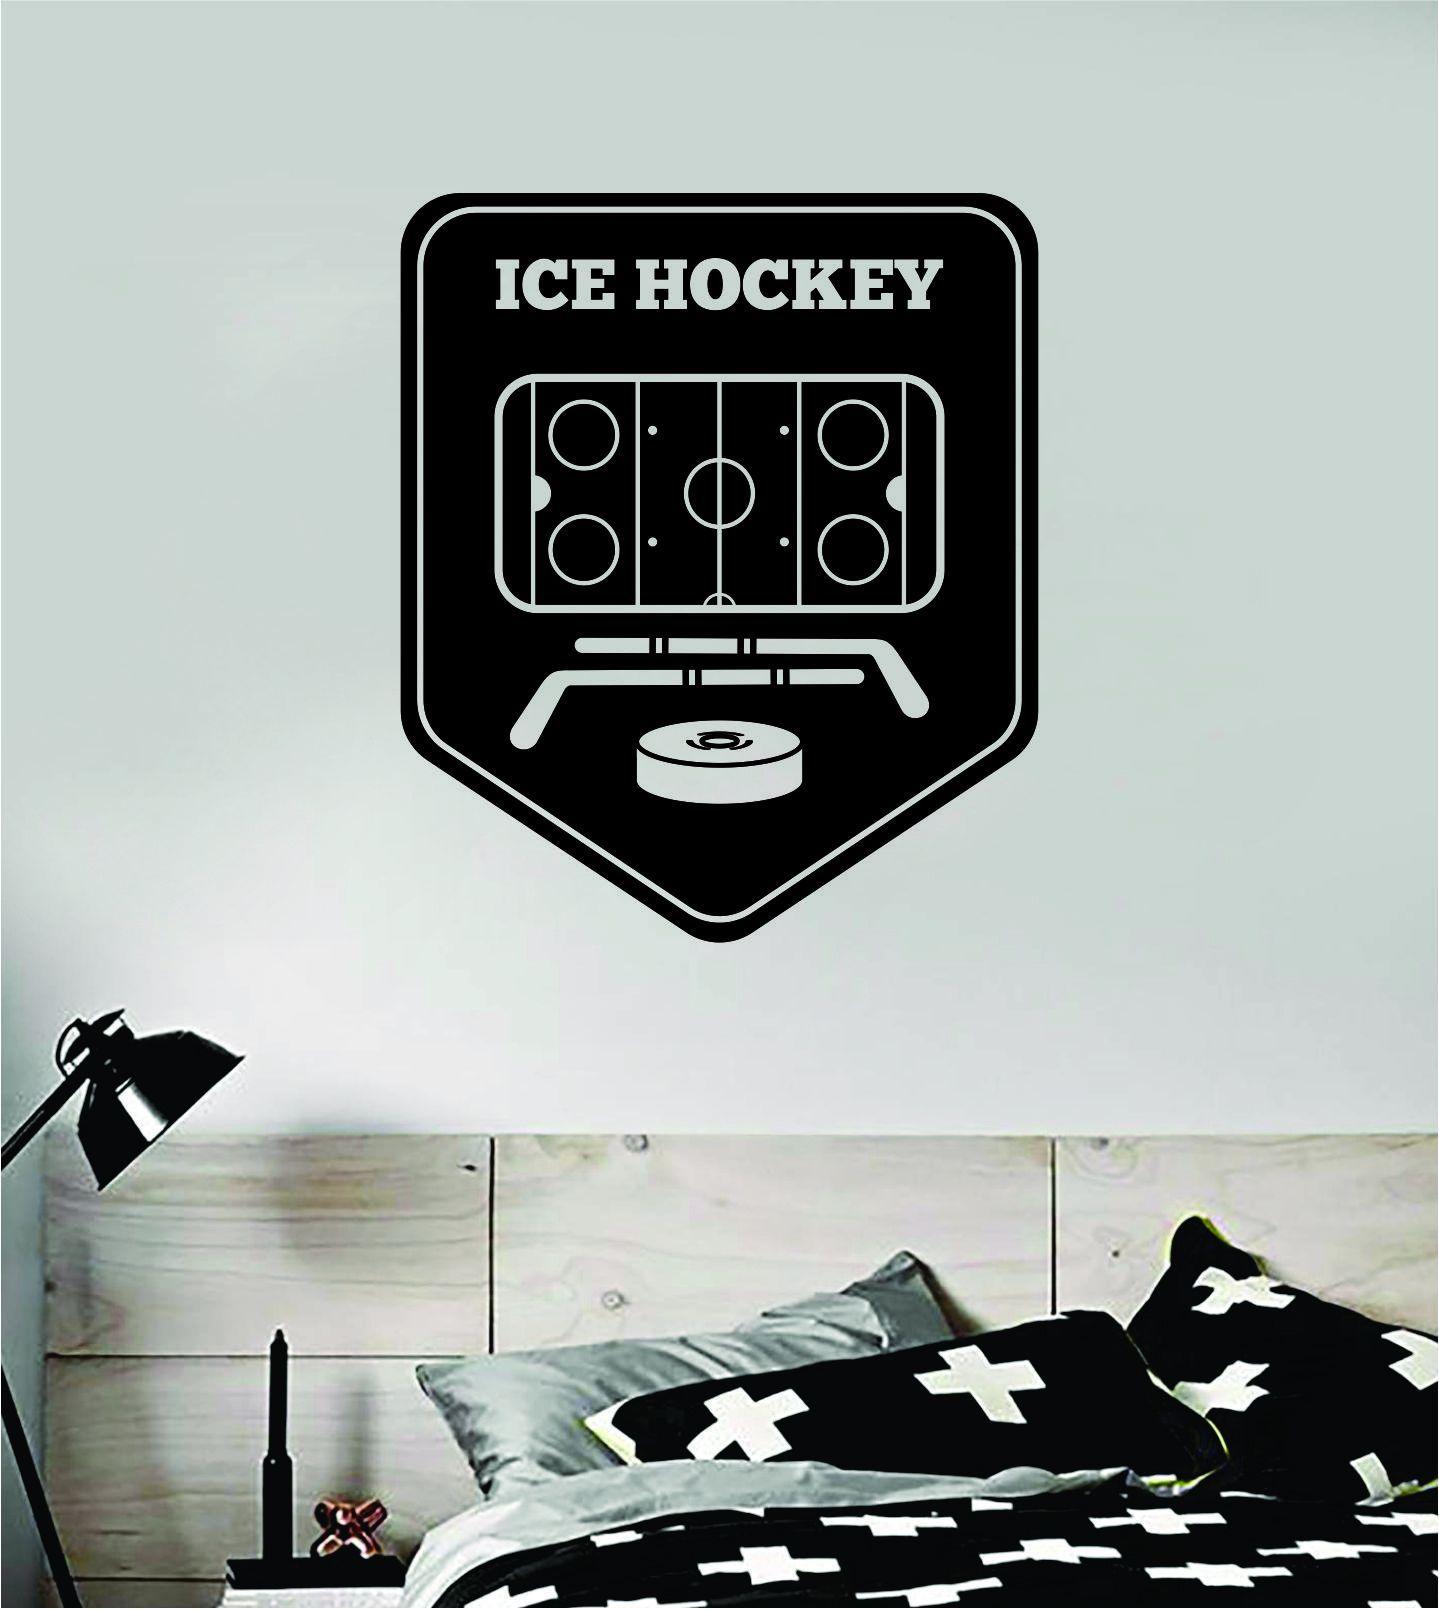 Ice Hockey Wall Decal Sticker Vinyl Art Bedroom Room Home Decor Quote Kids Teen Baby Boy Girl Nursery Skate Puck Stick NHL Winter - purple